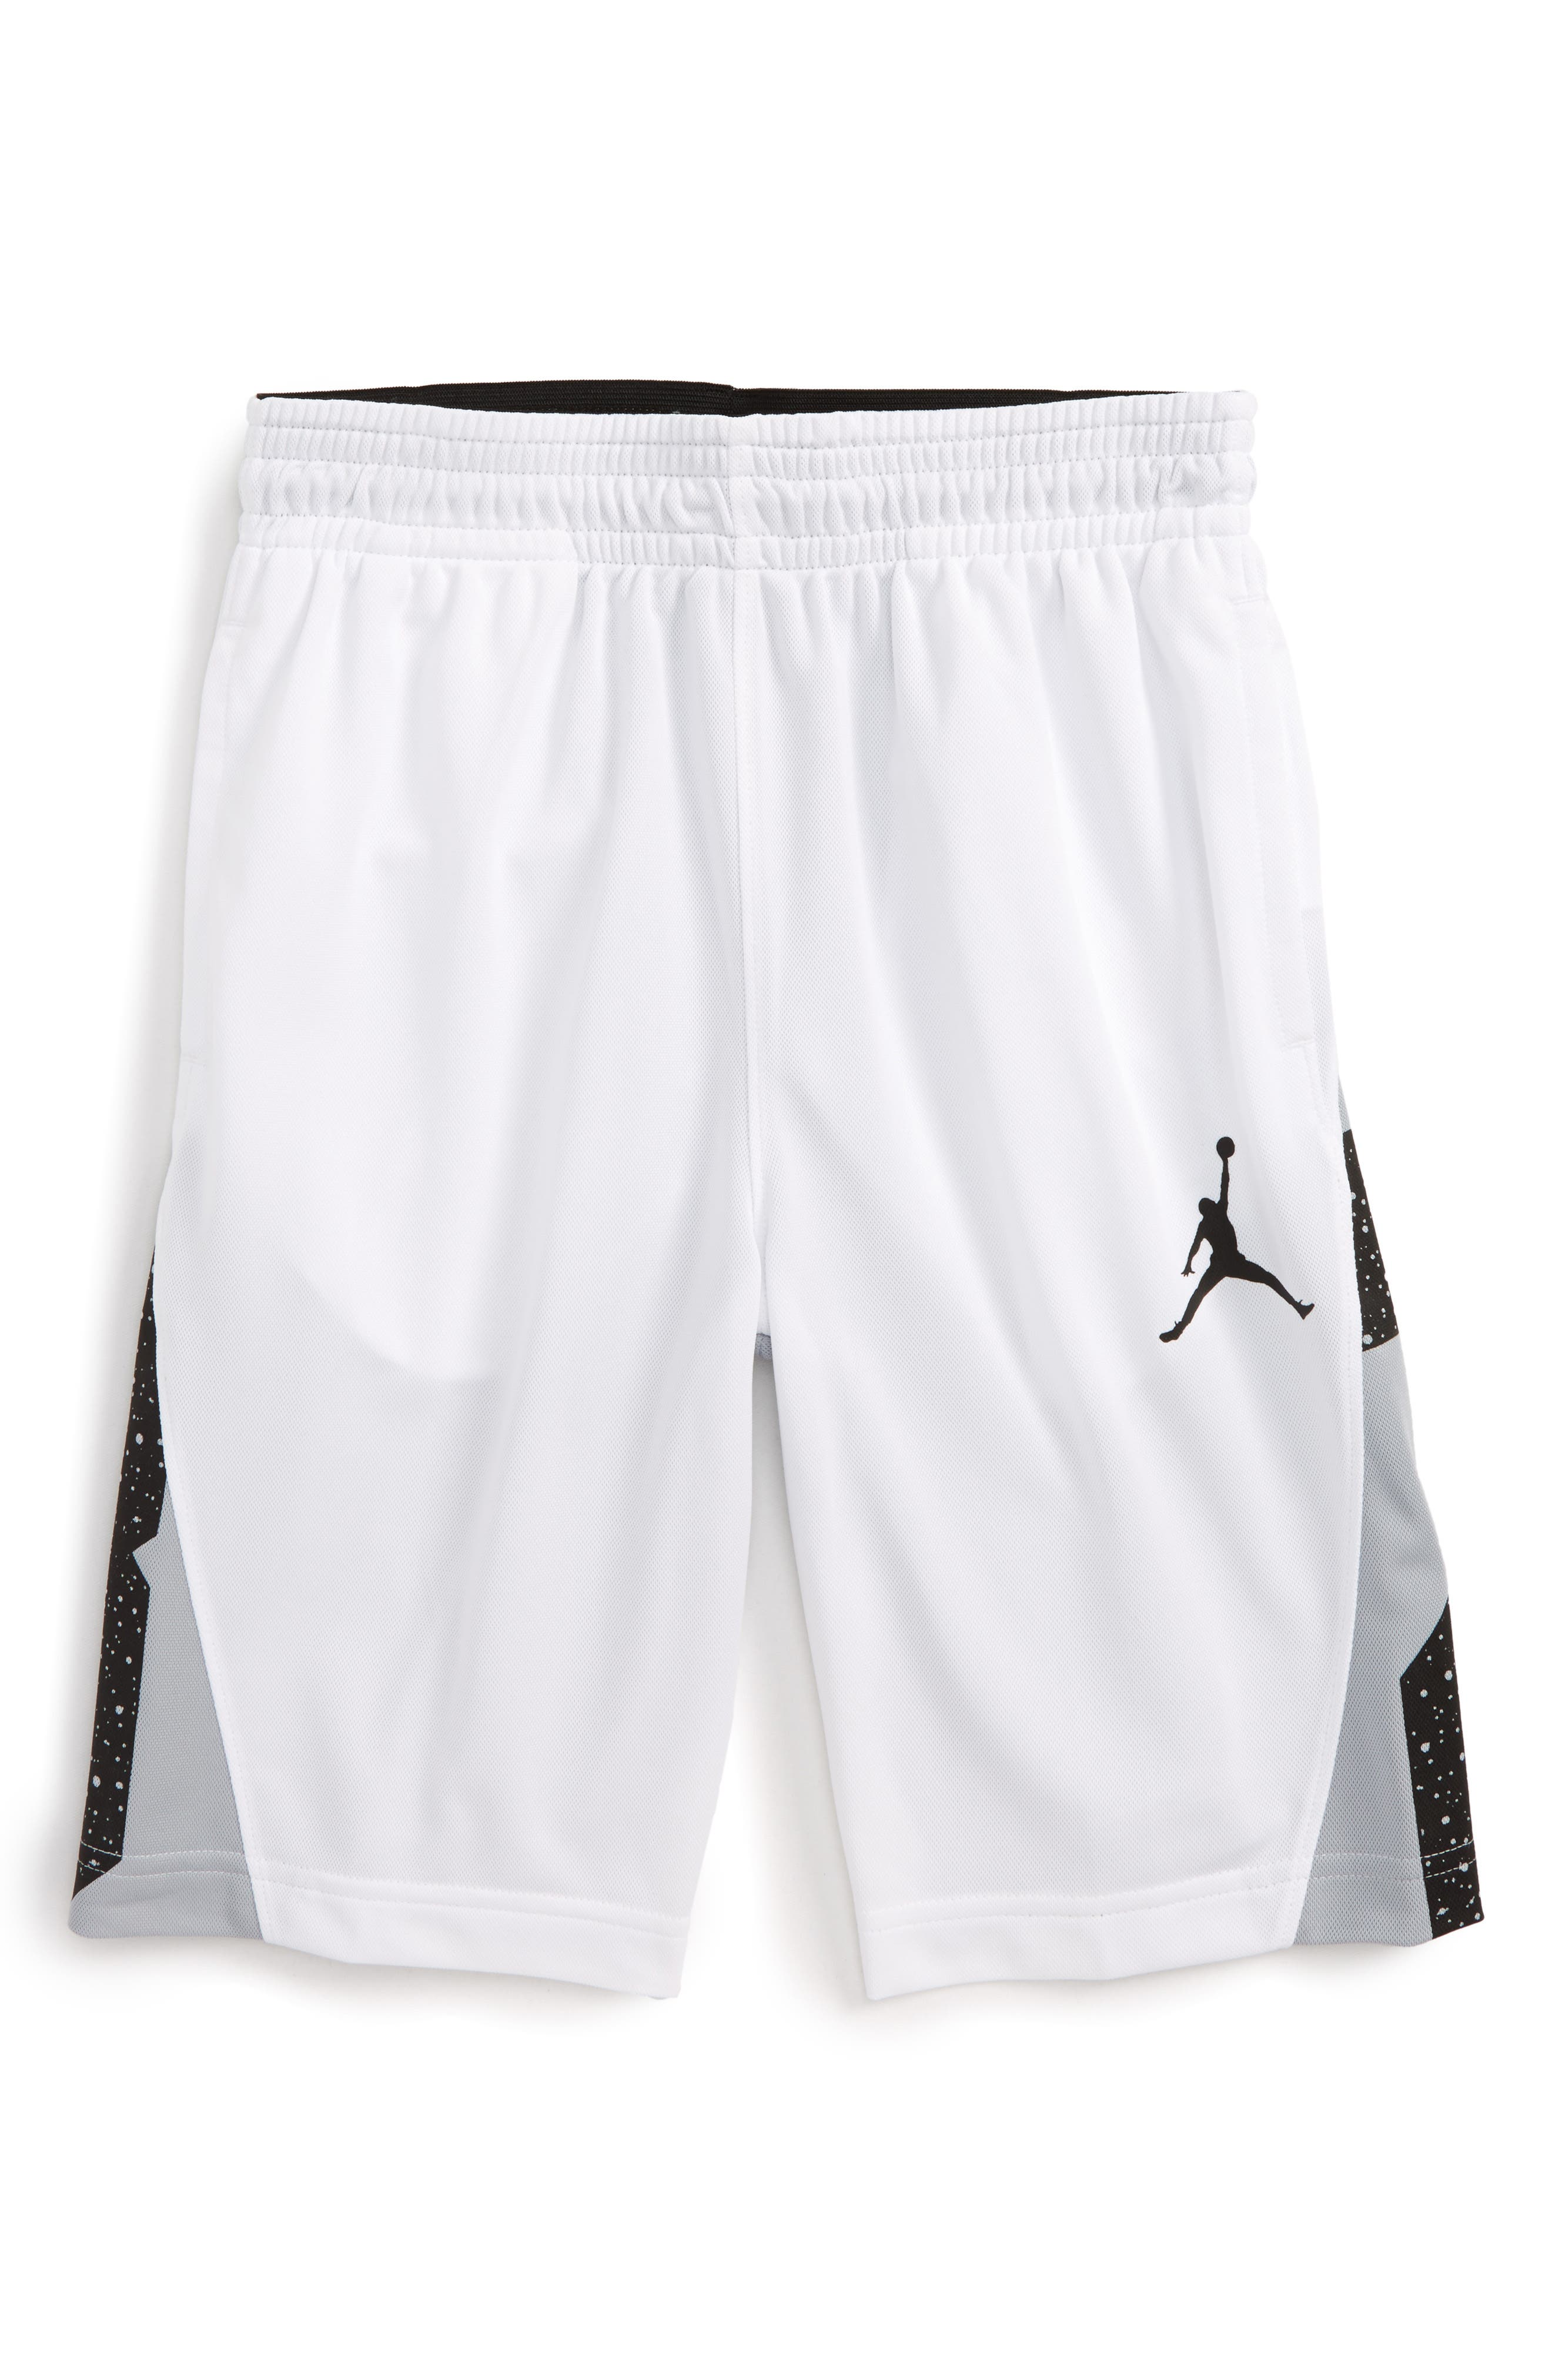 Jordan Speckle 23 Basketball Shorts (Big Boys)